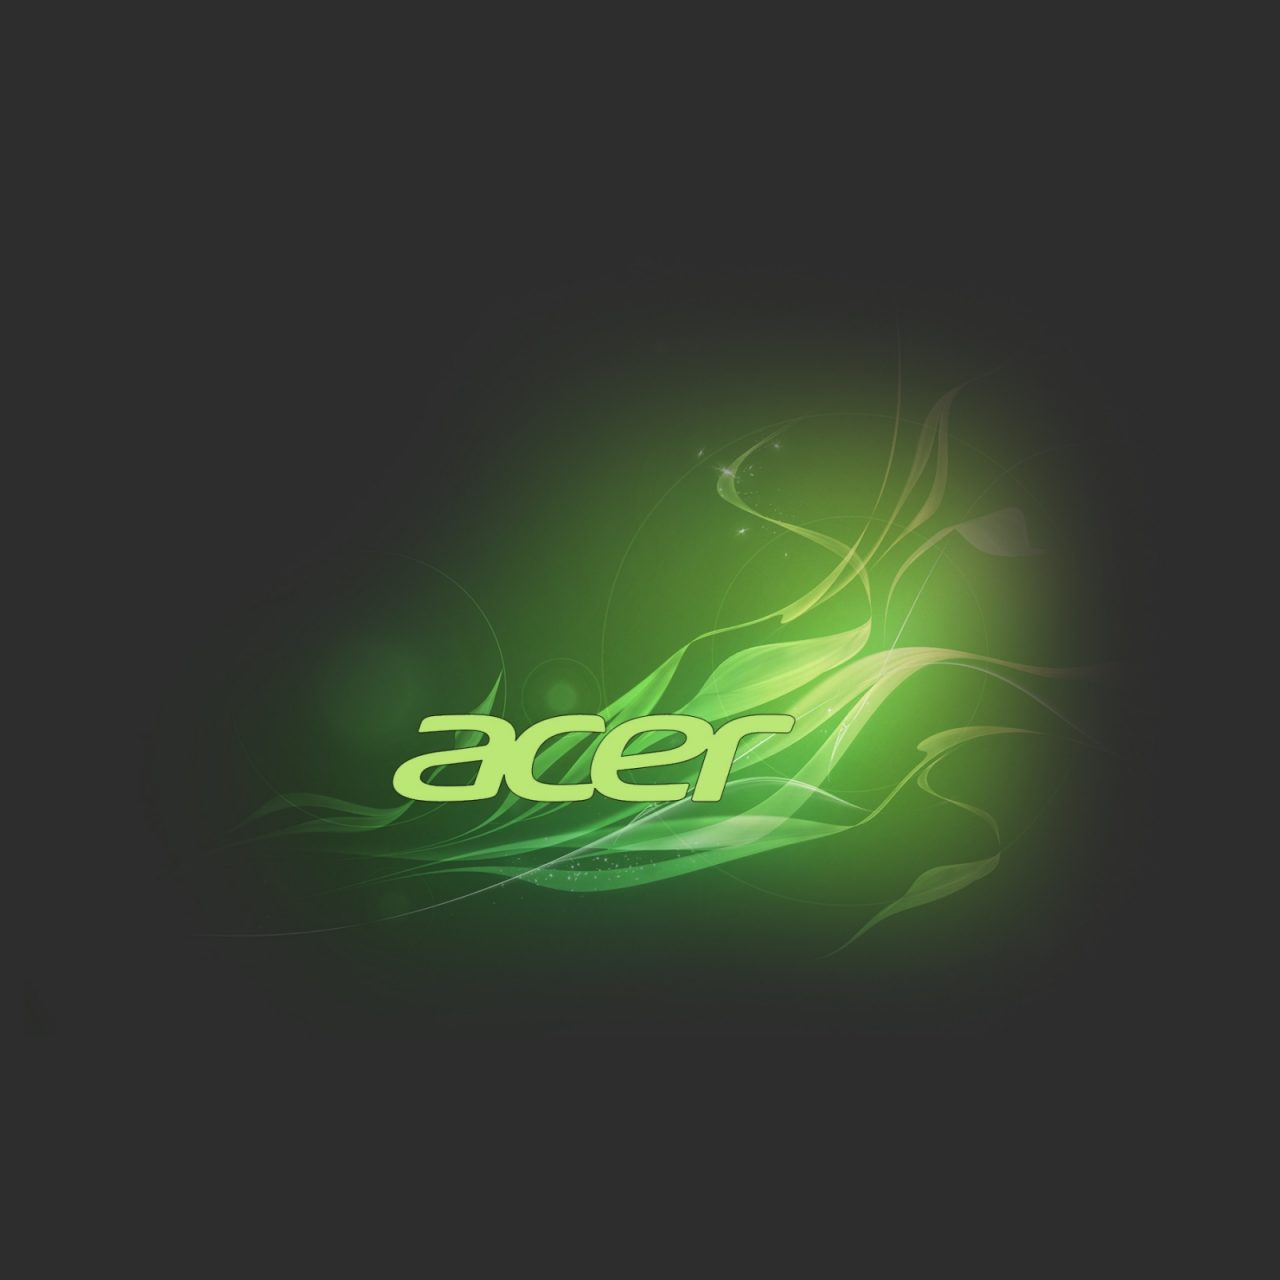 Acer Logo (1) HD Wallpaper